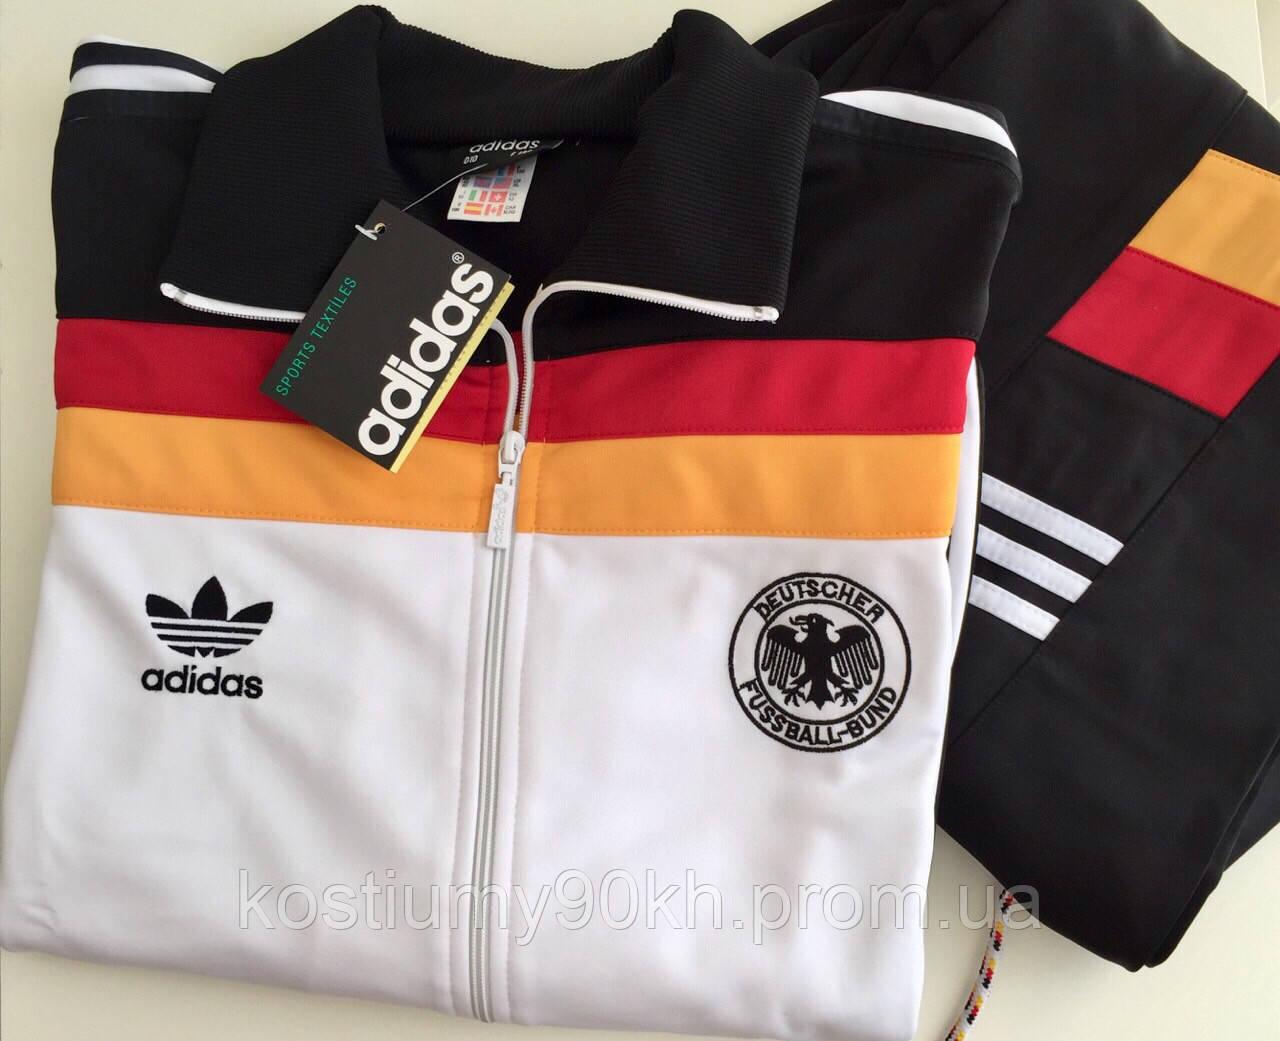 e577363fabeb Спортивный костюм Adidas(Австрия)эластик